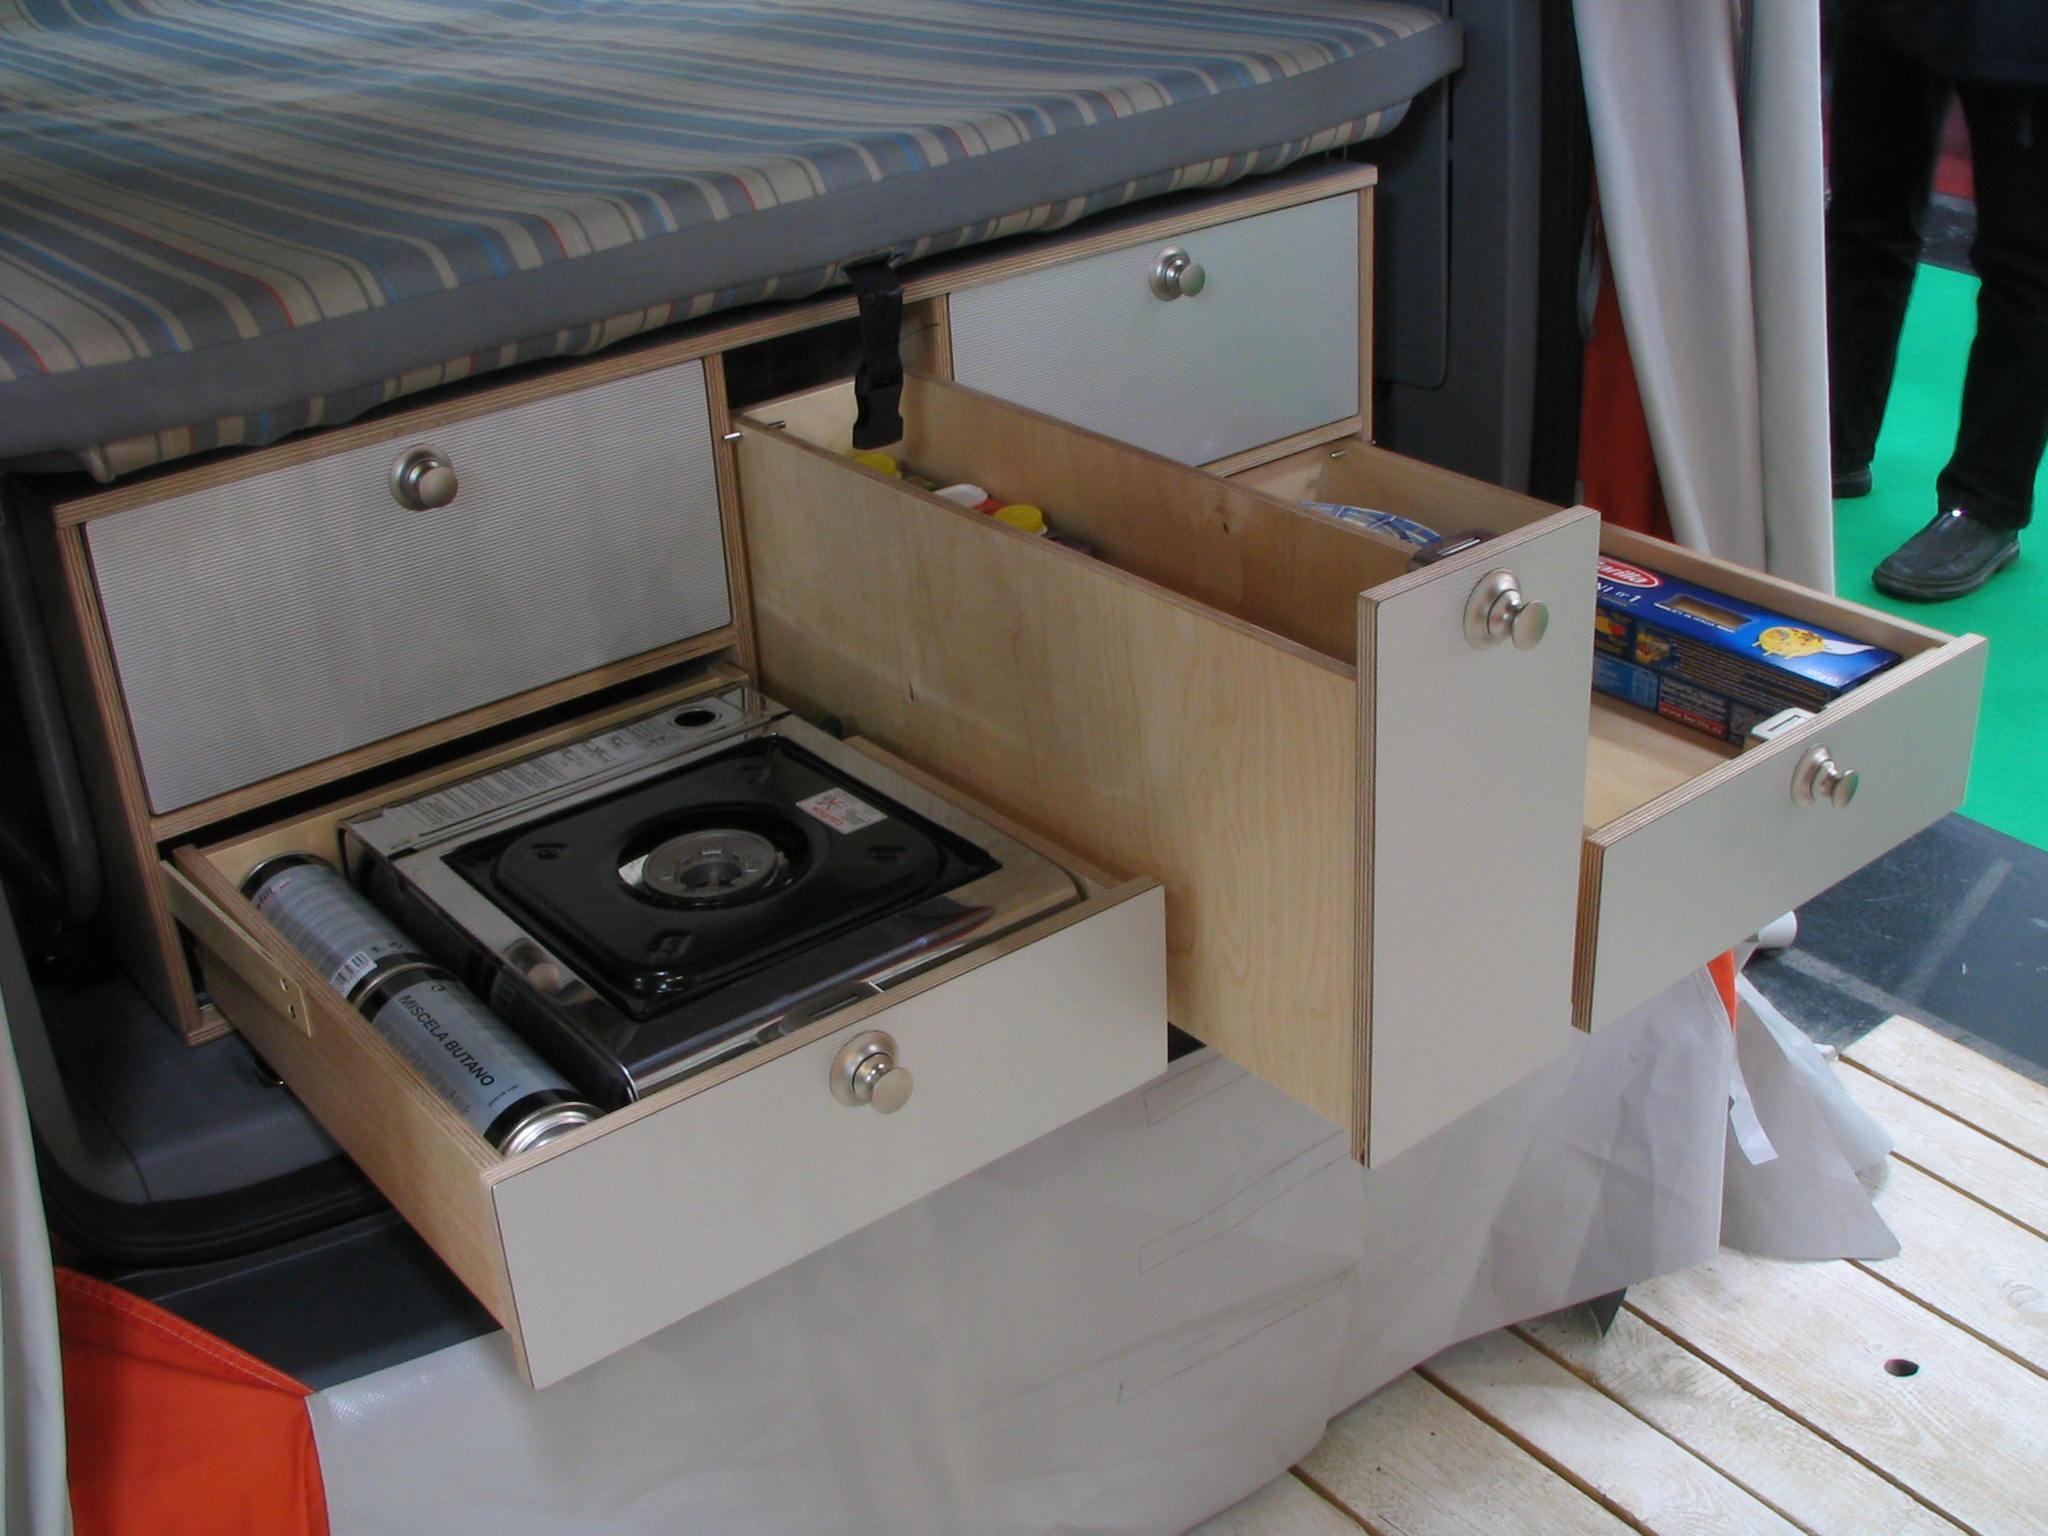 Kühlschrank Vw : Vw caddy campingeinrichtung